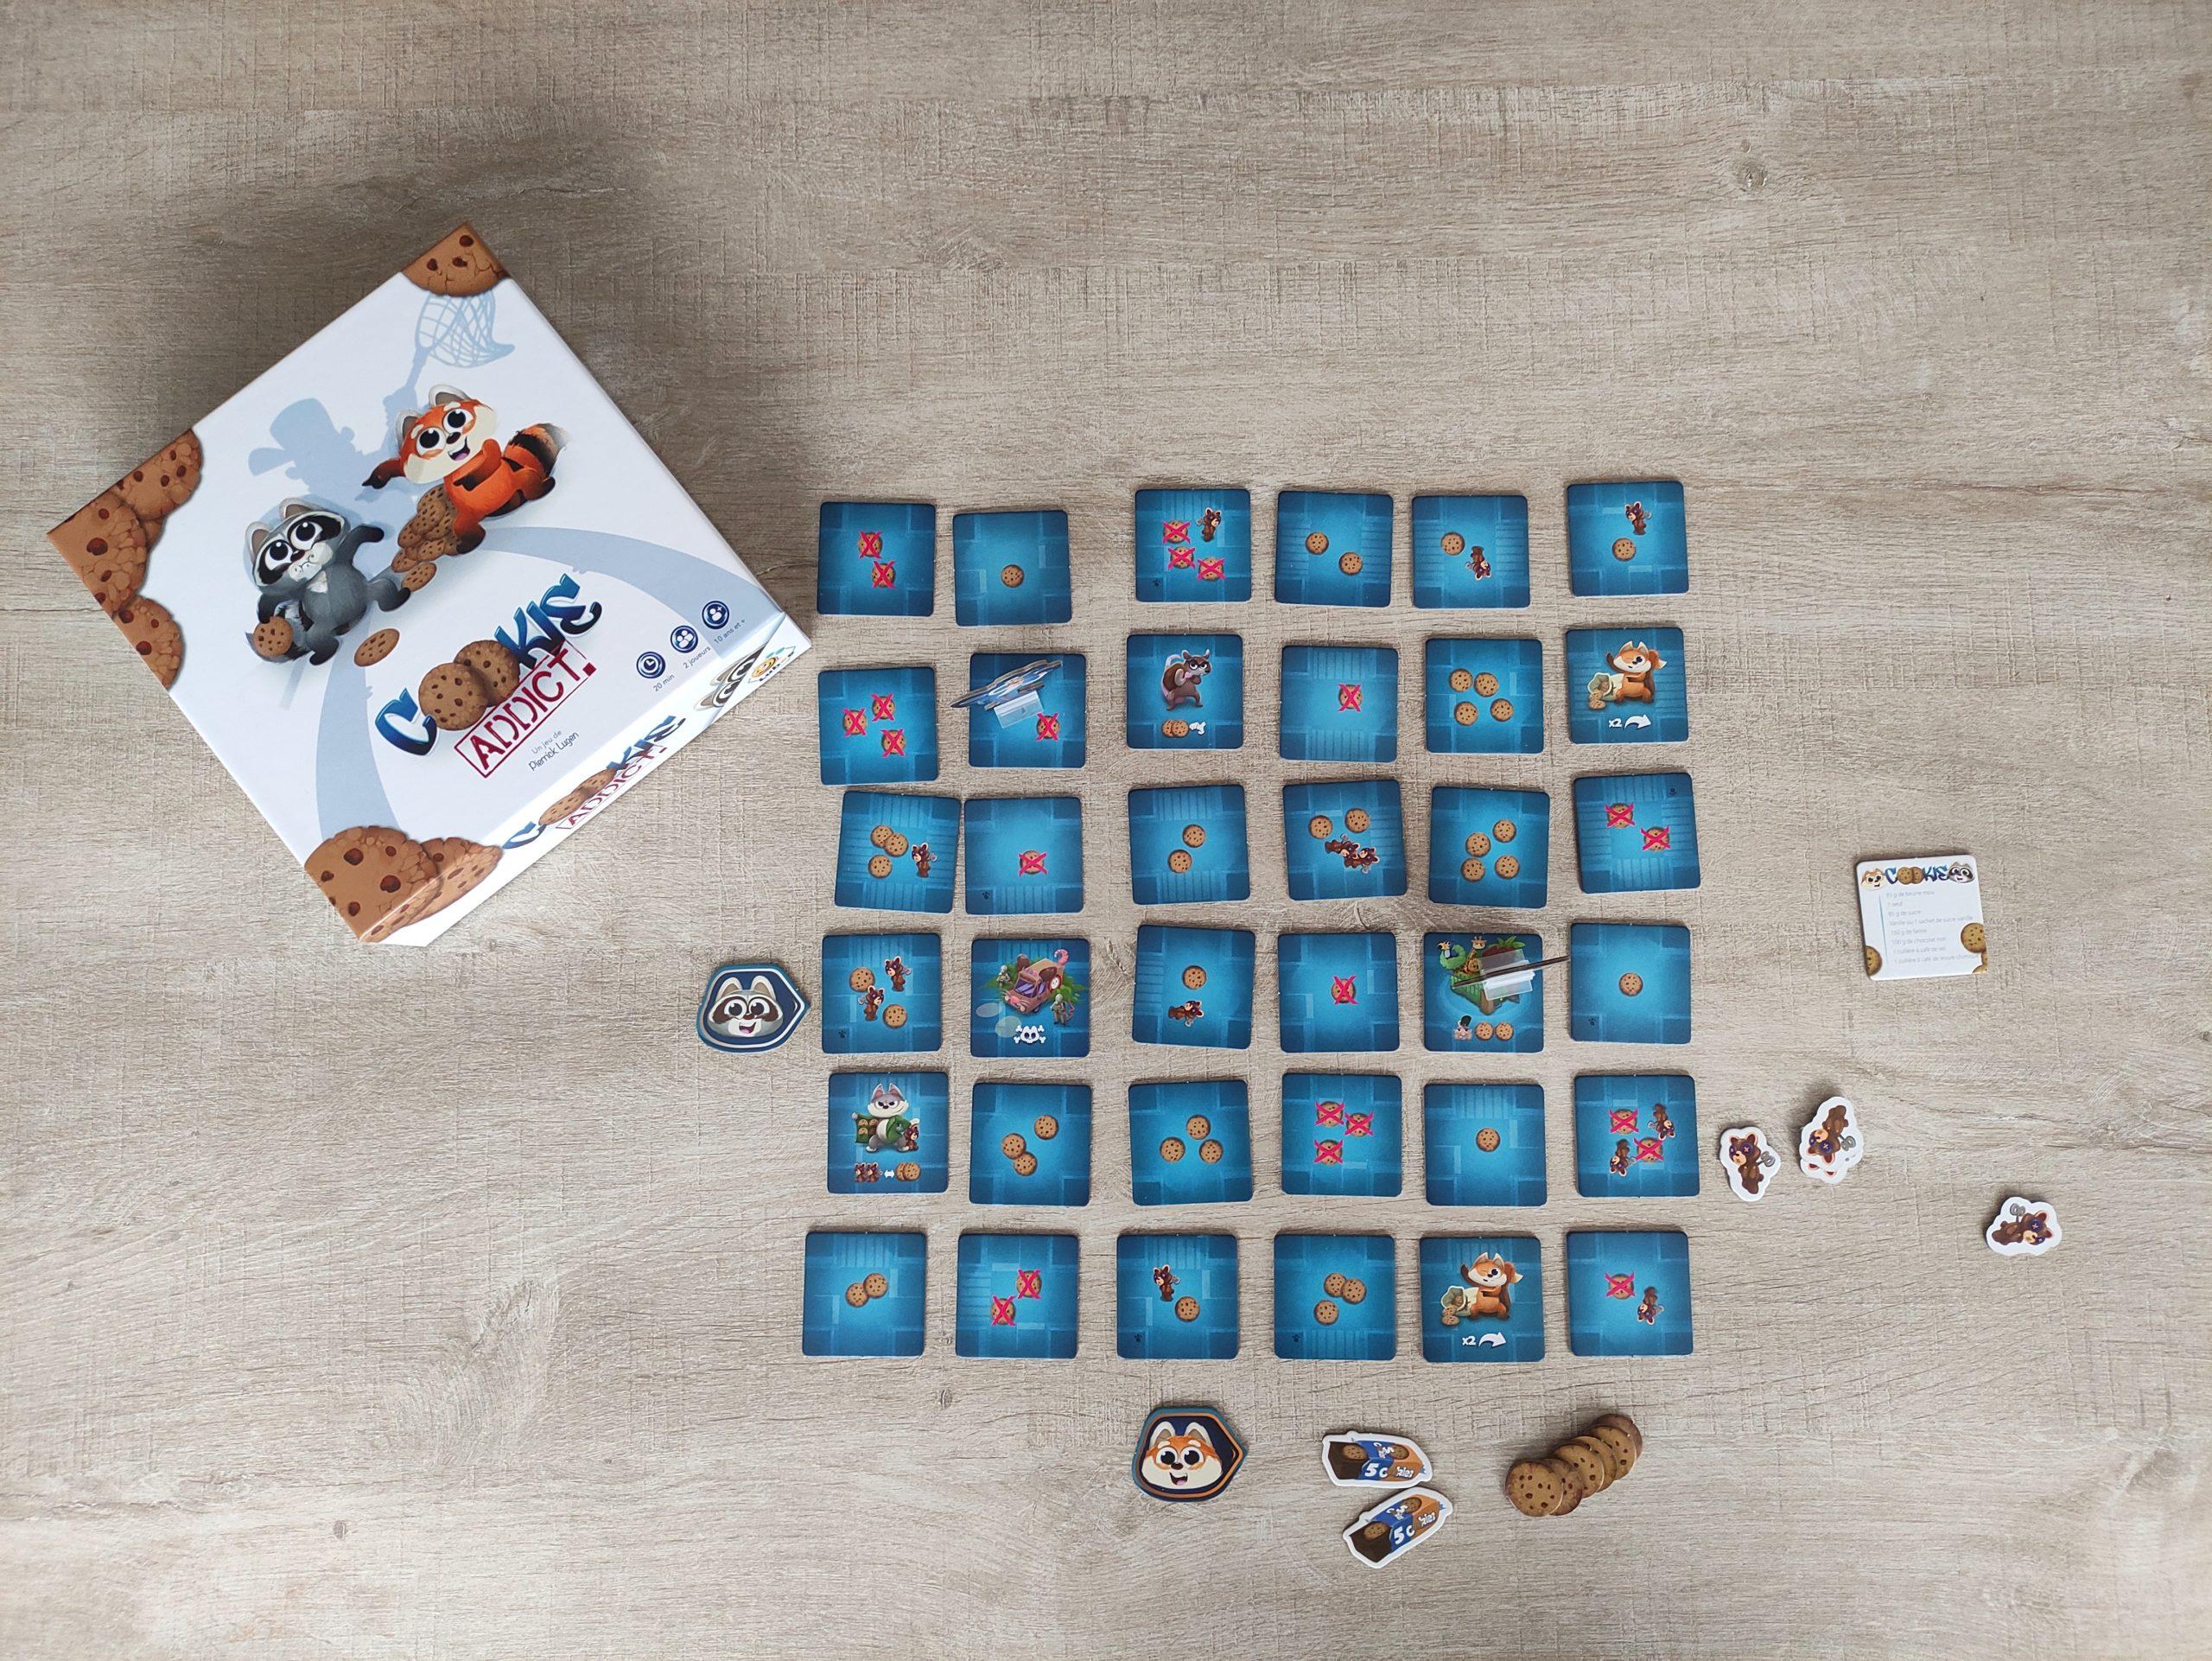 jeu test avis cookies addict